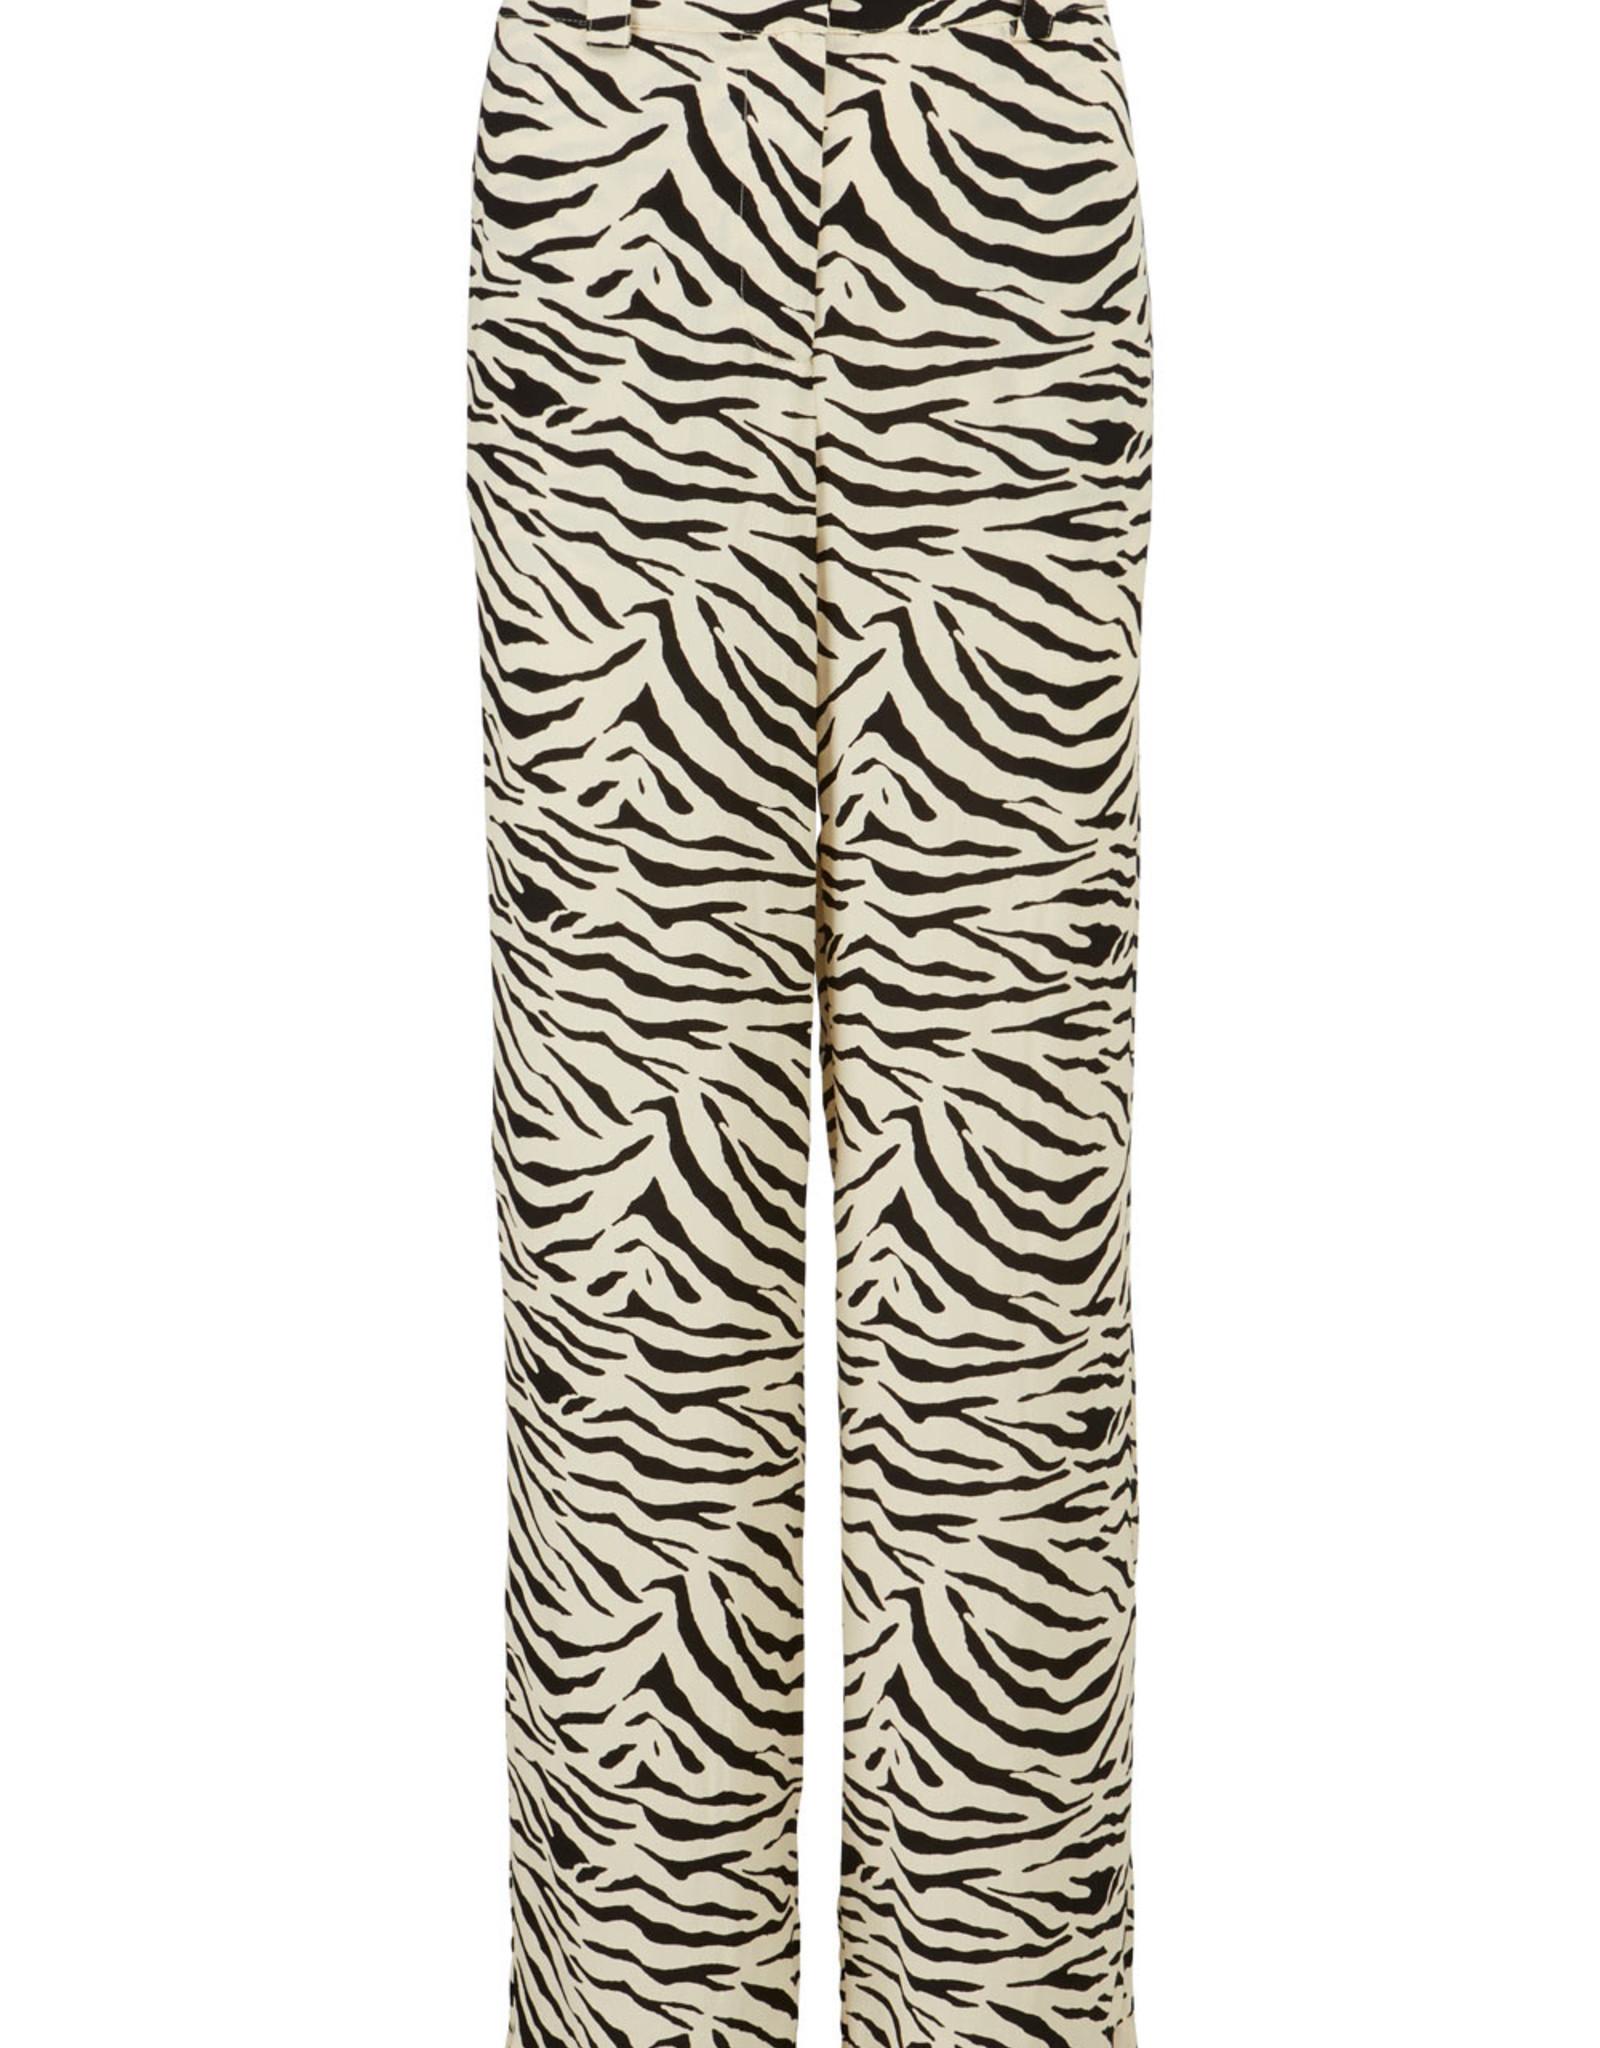 Modstrom Ibu Print Pants Zebra